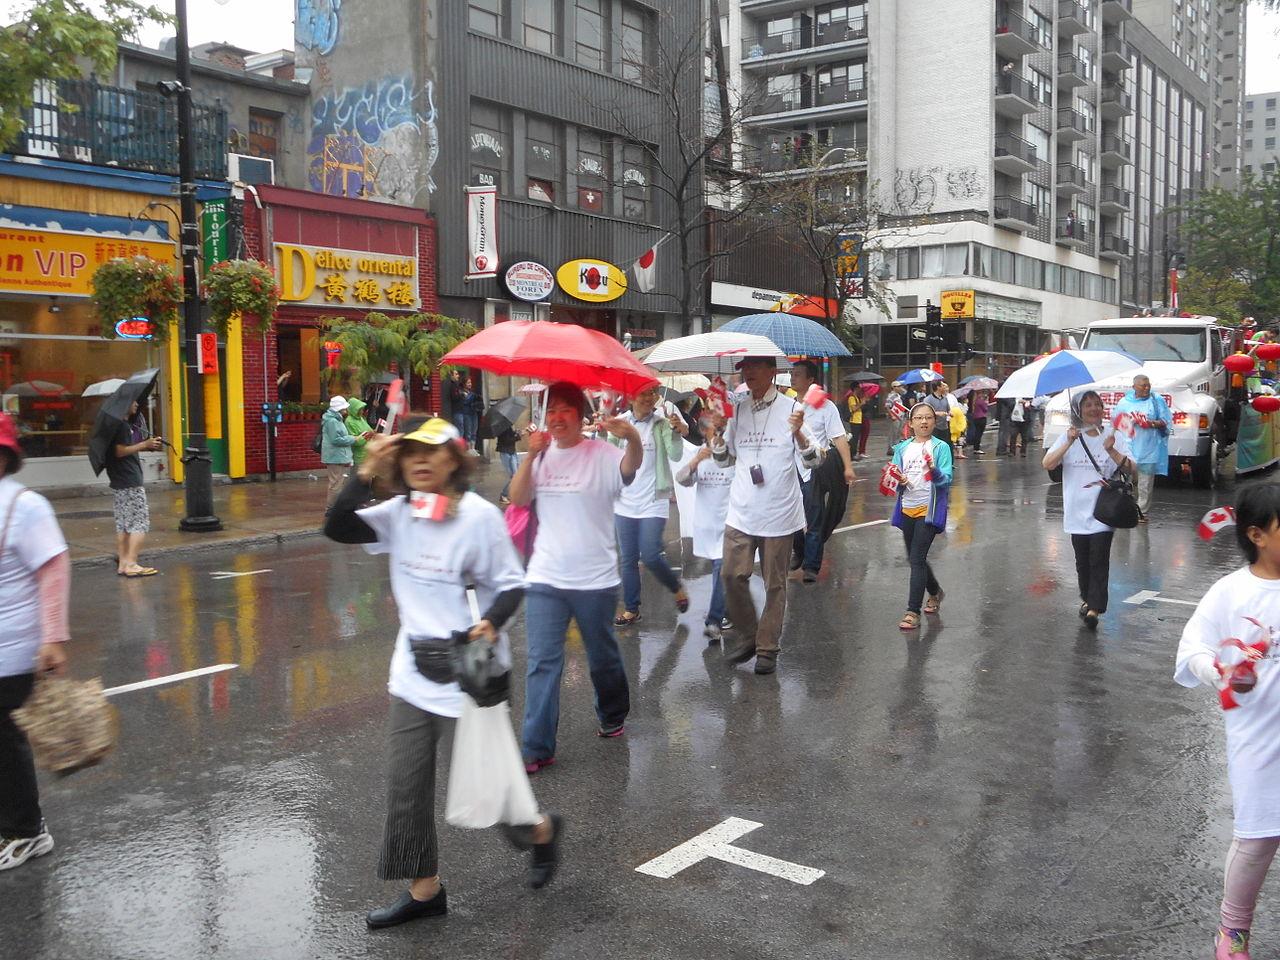 File:Canada Day 2015 on Saint Catherine Street - 326.jpg - Wikimedia